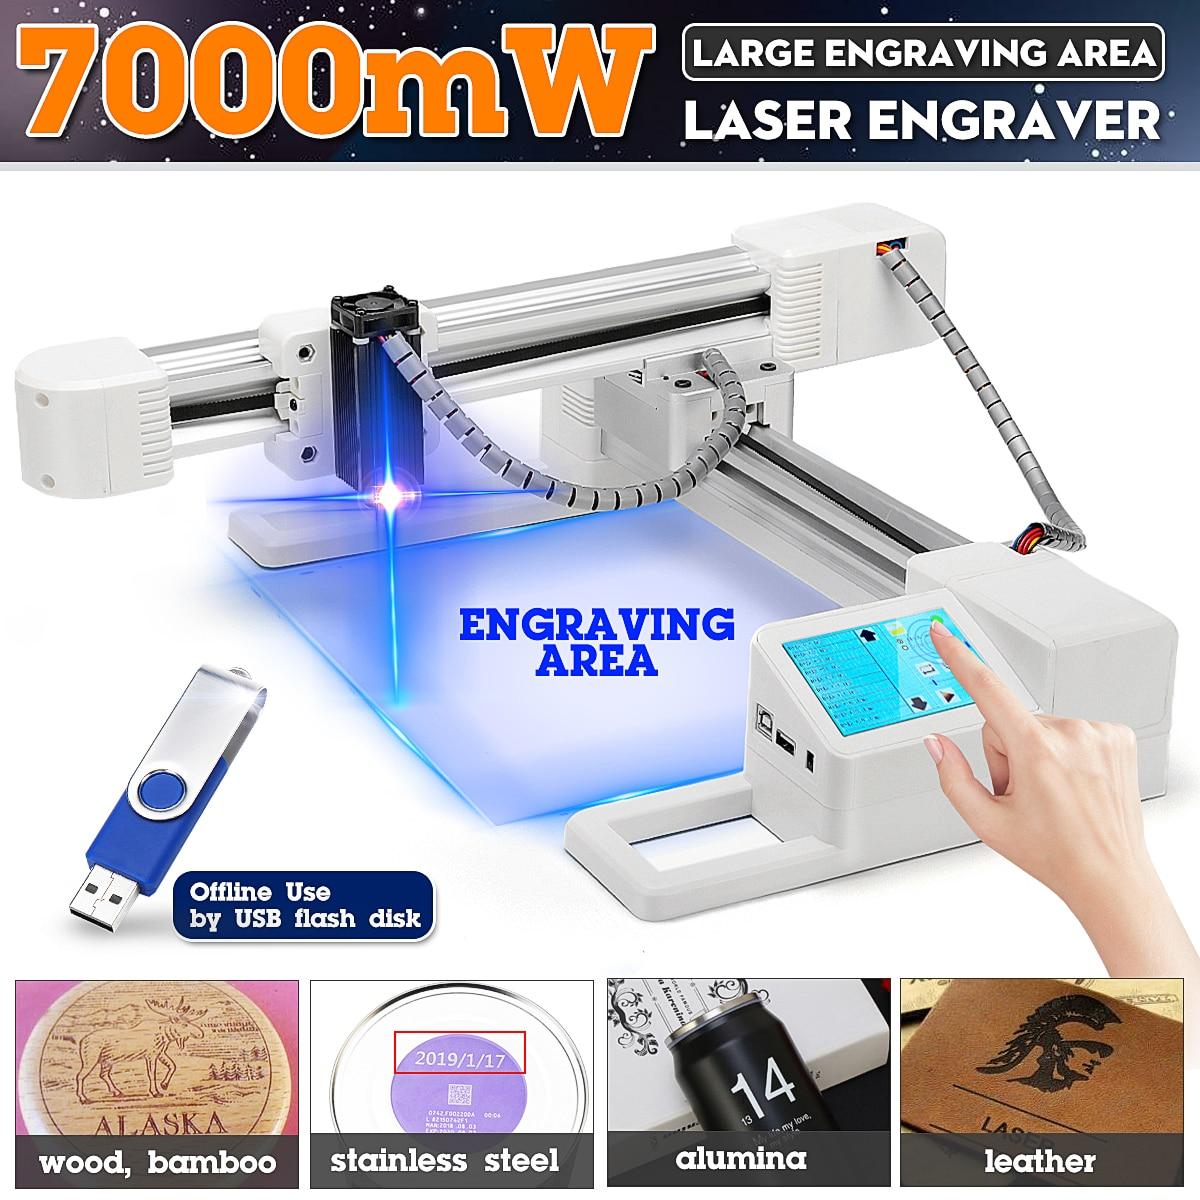 7000mW DIY Computer Laser Engraver Stainless Steel Laser Cutter Marking Machine Logo Mark Printer For Windows-97/03/7/8/10